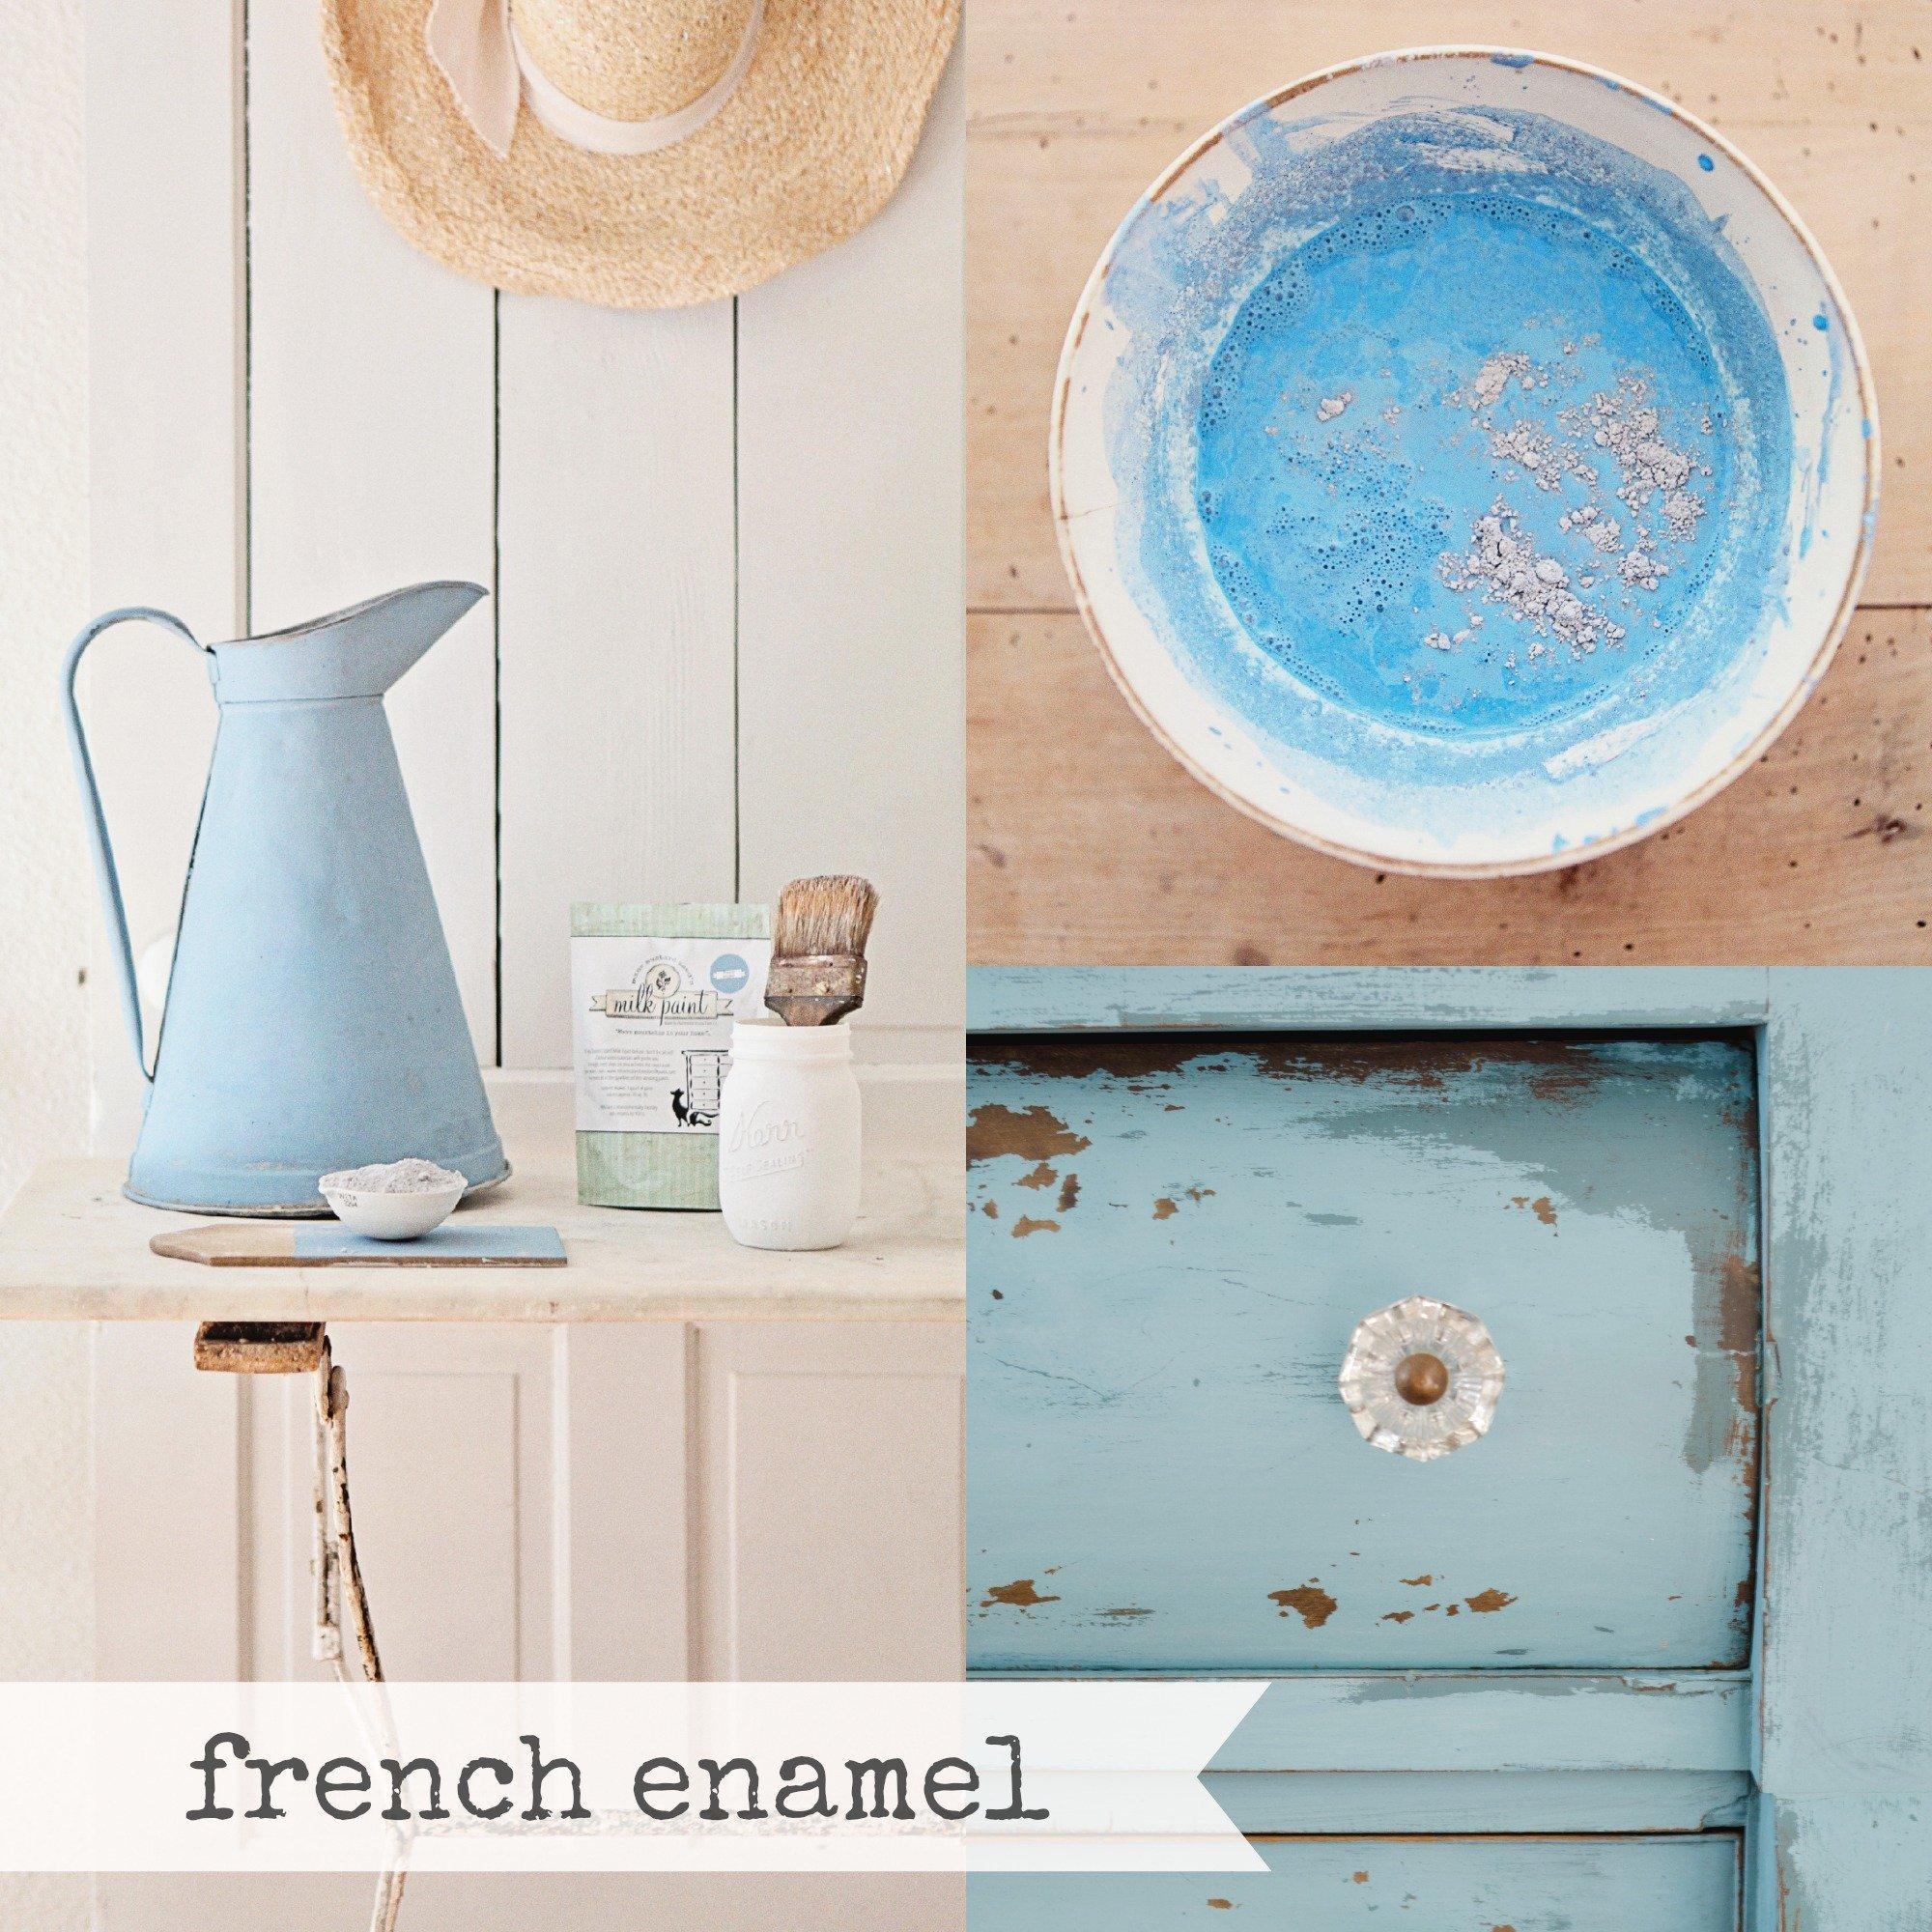 Miss Mustard Seed Milk Paint - French Enamel - Raggedy Bits